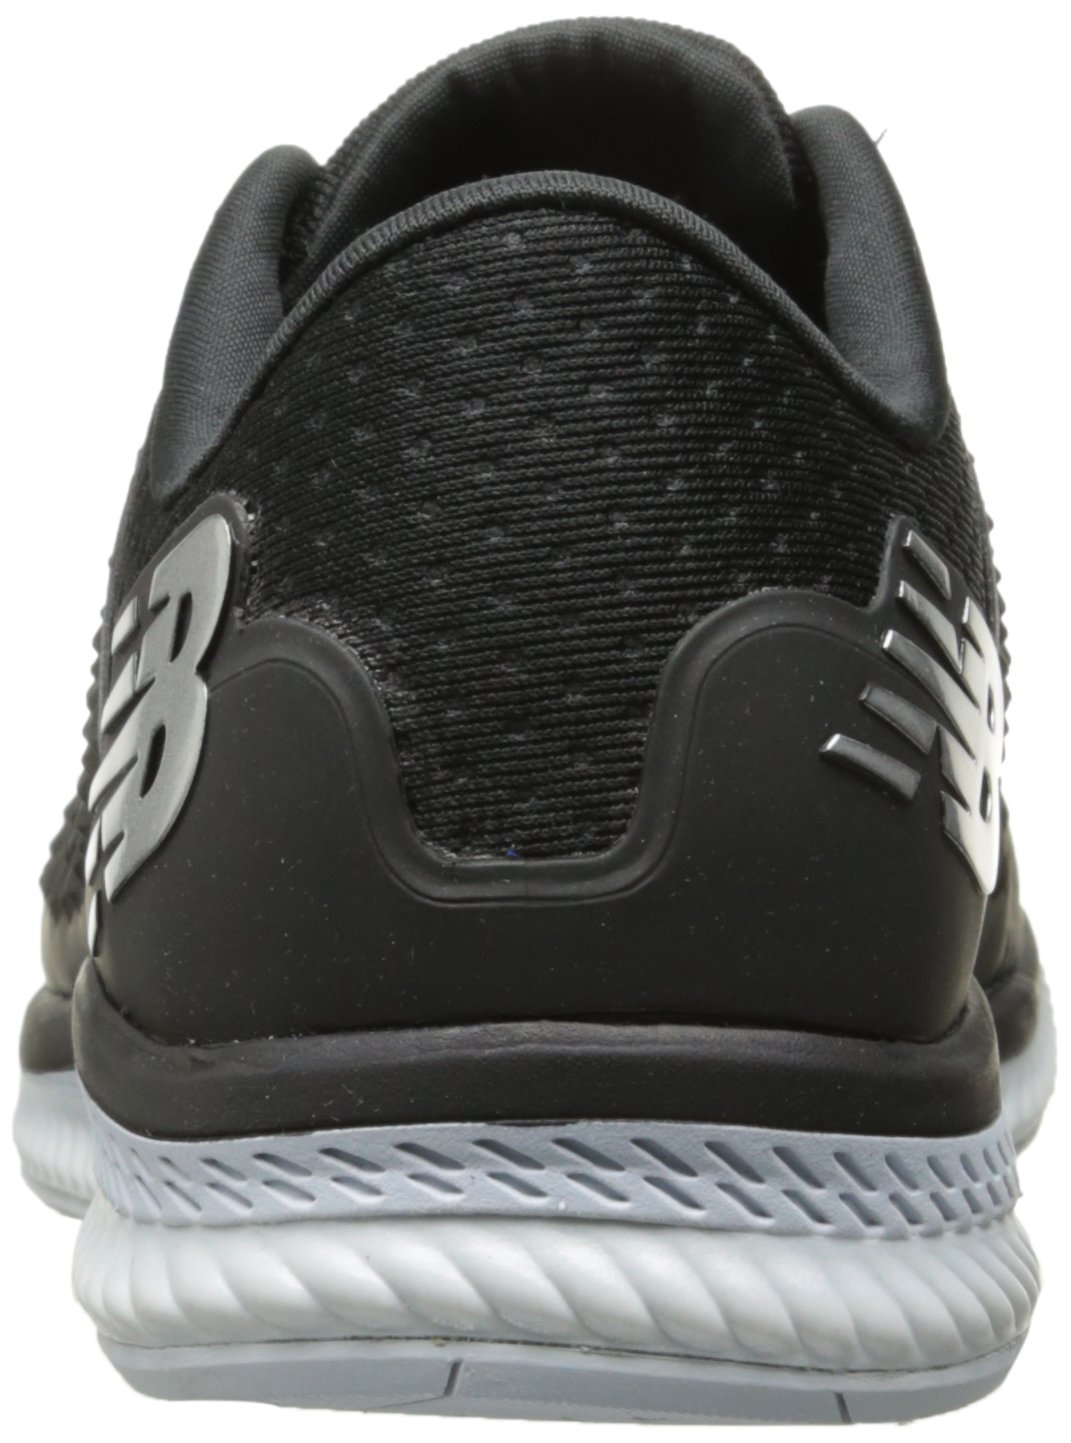 New Balance Women's FuelCell Running US|Black/Black Shoe B01NB9ITBD 8.5 D US|Black/Black Running 4da2b1